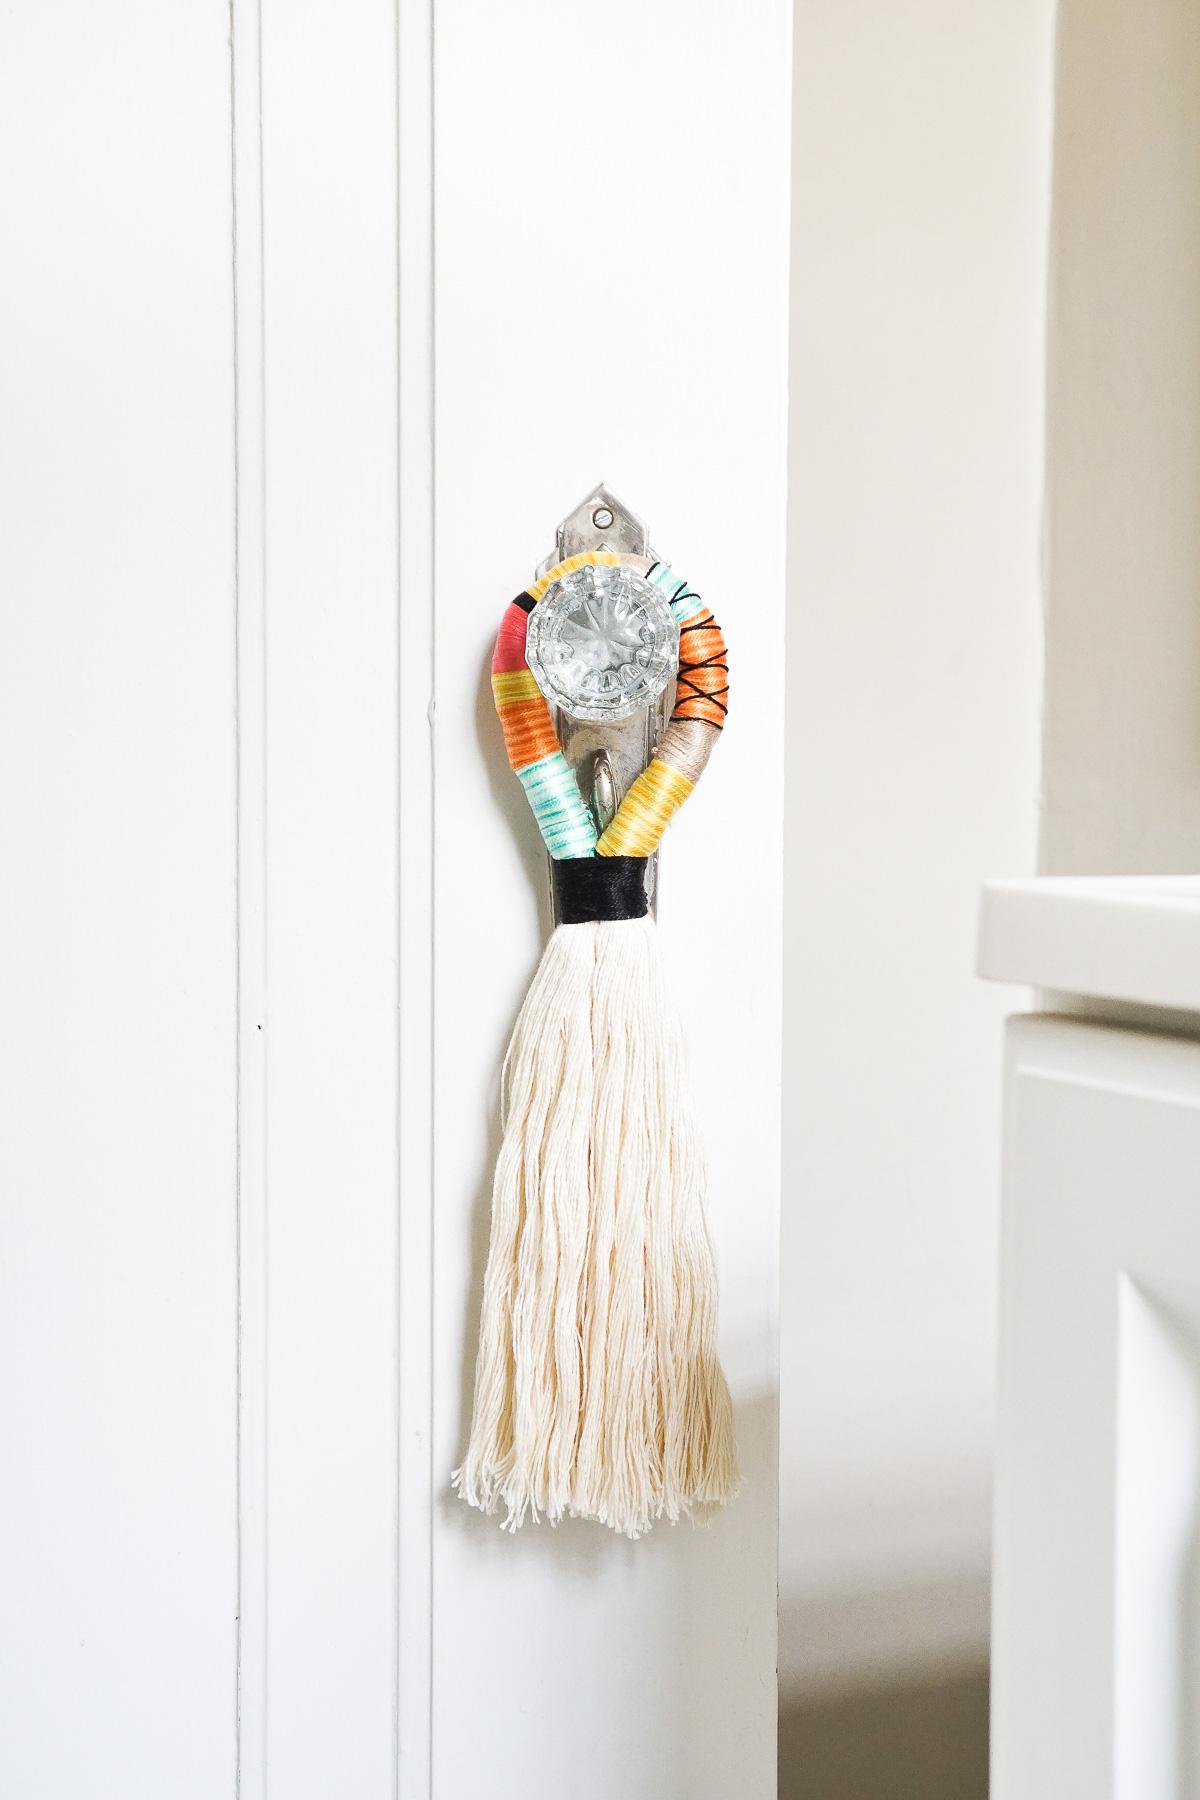 Home Design Trends: Chic Door Knob Tassels. DIY Door Handle Rope Tassels. Click through for the details.   glitterinc.com   @glitterinc